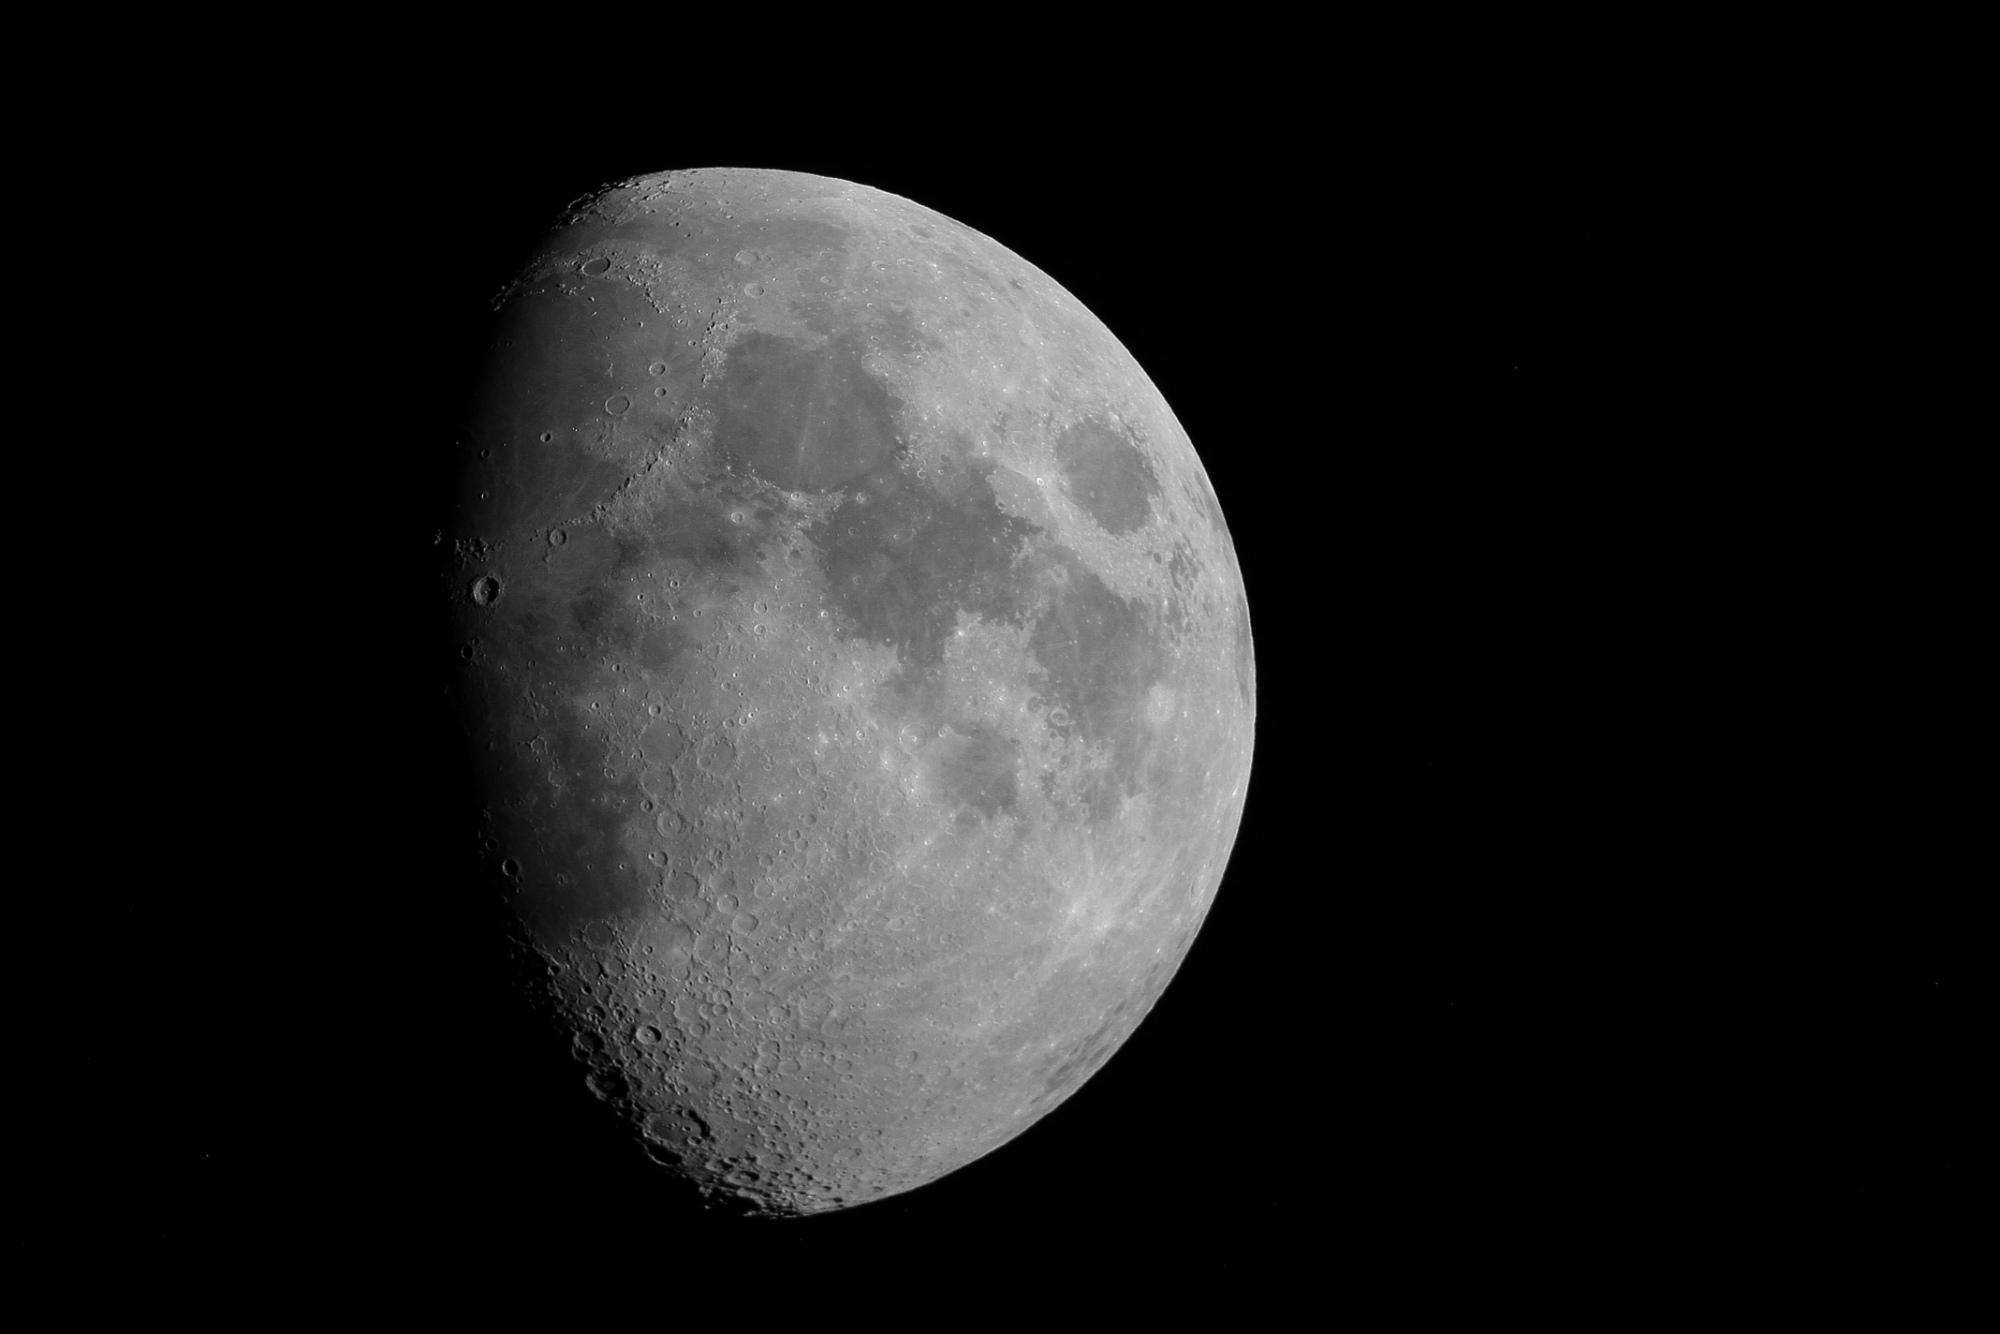 Moon1.thumb.jpg.c7948f15c98520defa6526219cb9a7b0.jpg